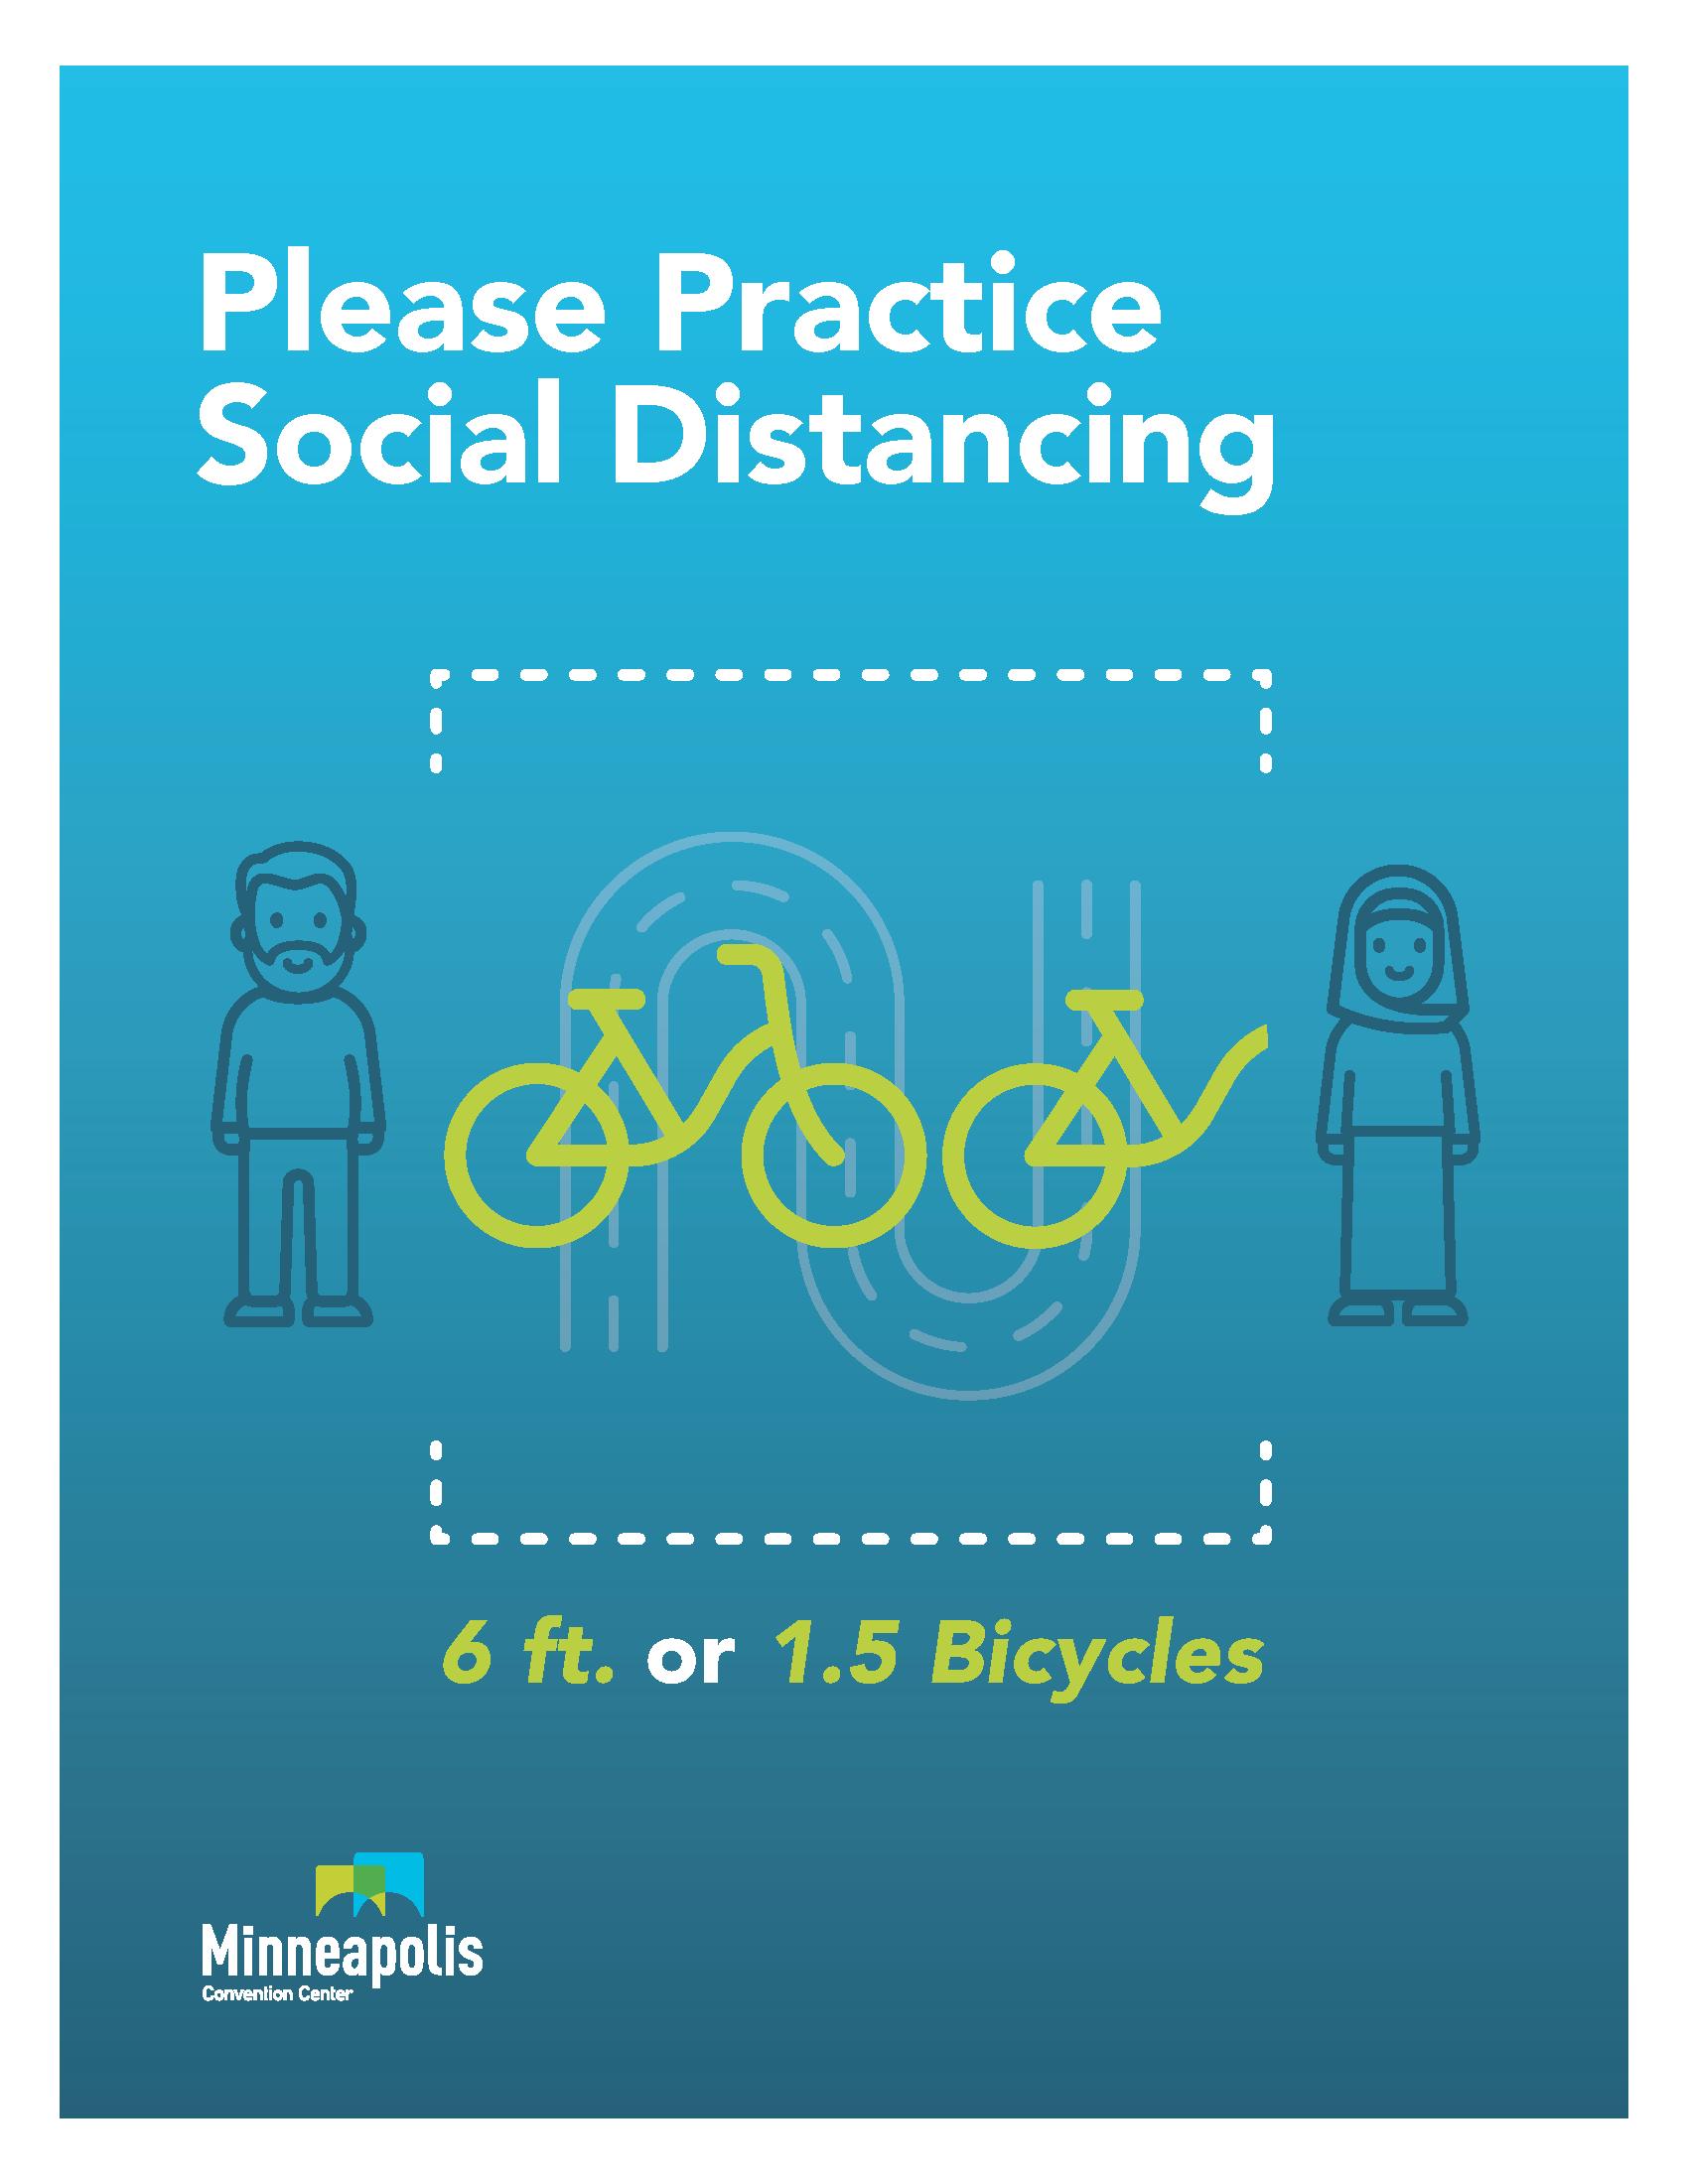 Safety-Reminder-Social-Distancing-Bikes.png?mtime=20200817134414#asset:7604534